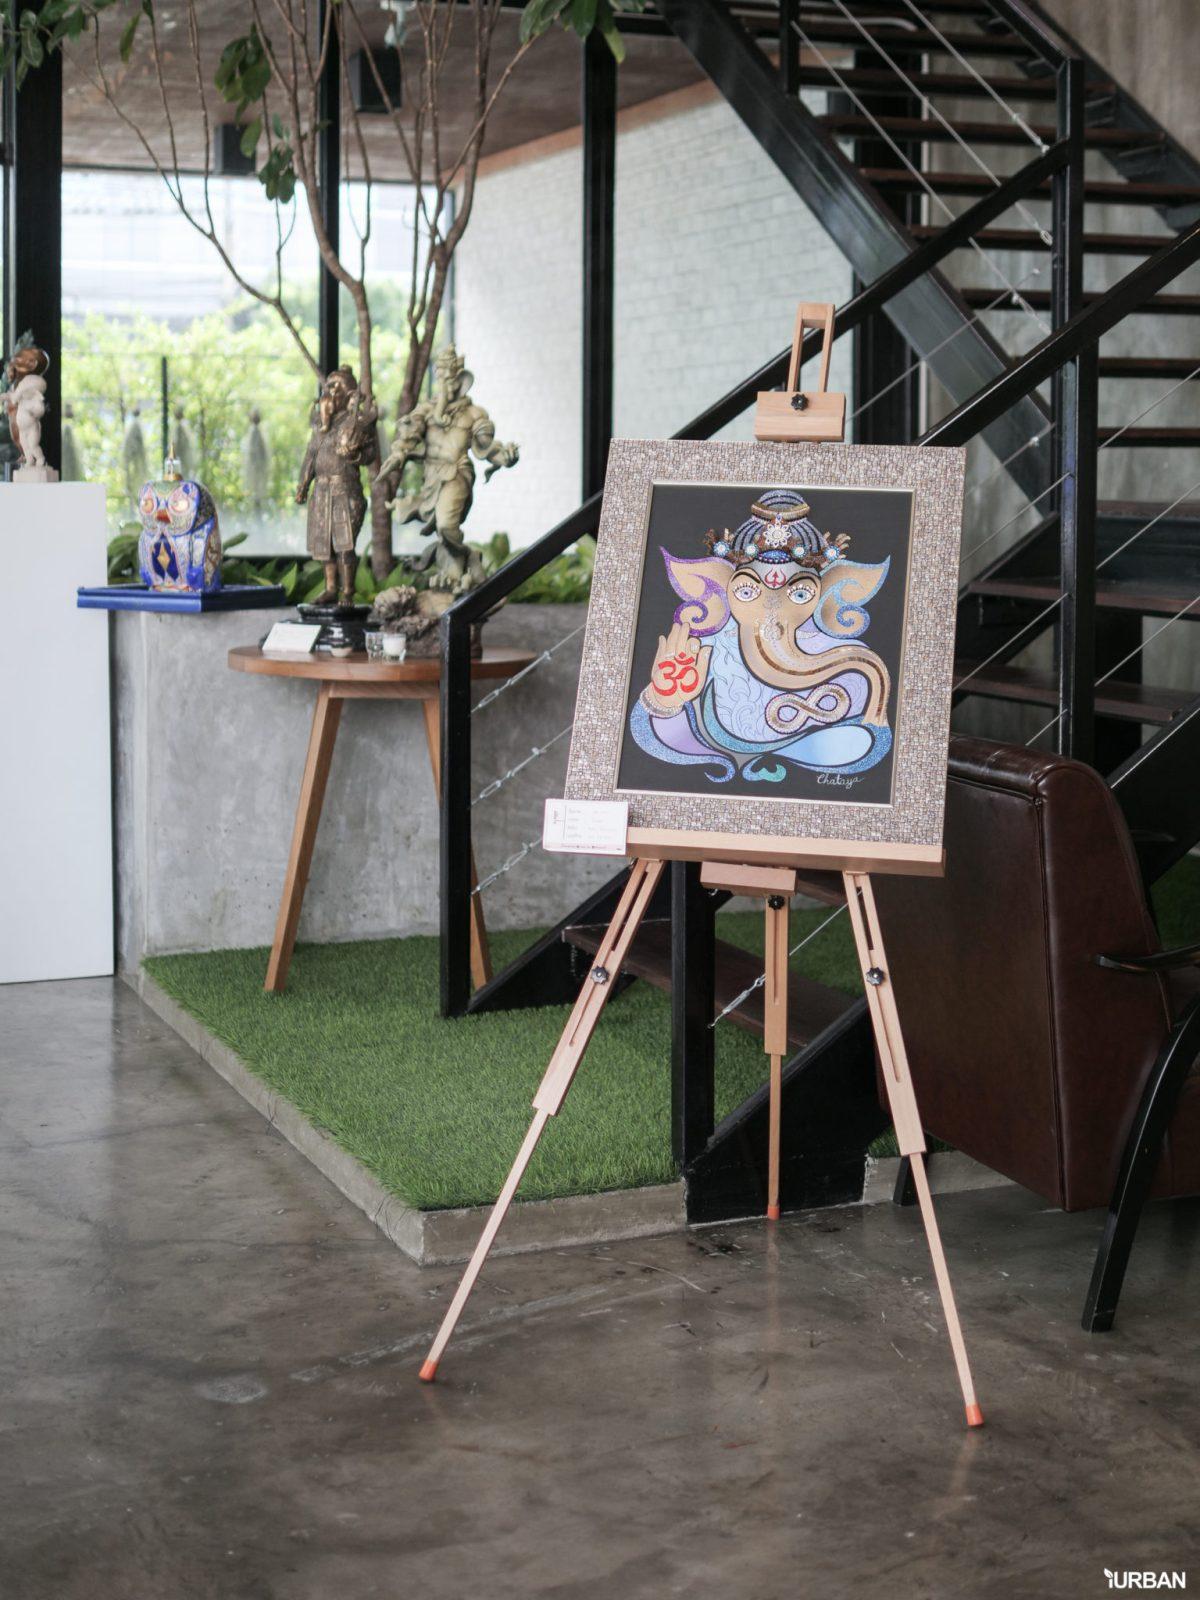 "7 Simply Creative Cafe & Bar ในย่านไลฟ์สไลต์สุดฮิป กับ 24 Hr. Co-Working Space กลาง New Interchange ""รัชดา - ลาดพร้าว"" 59 - cafe"